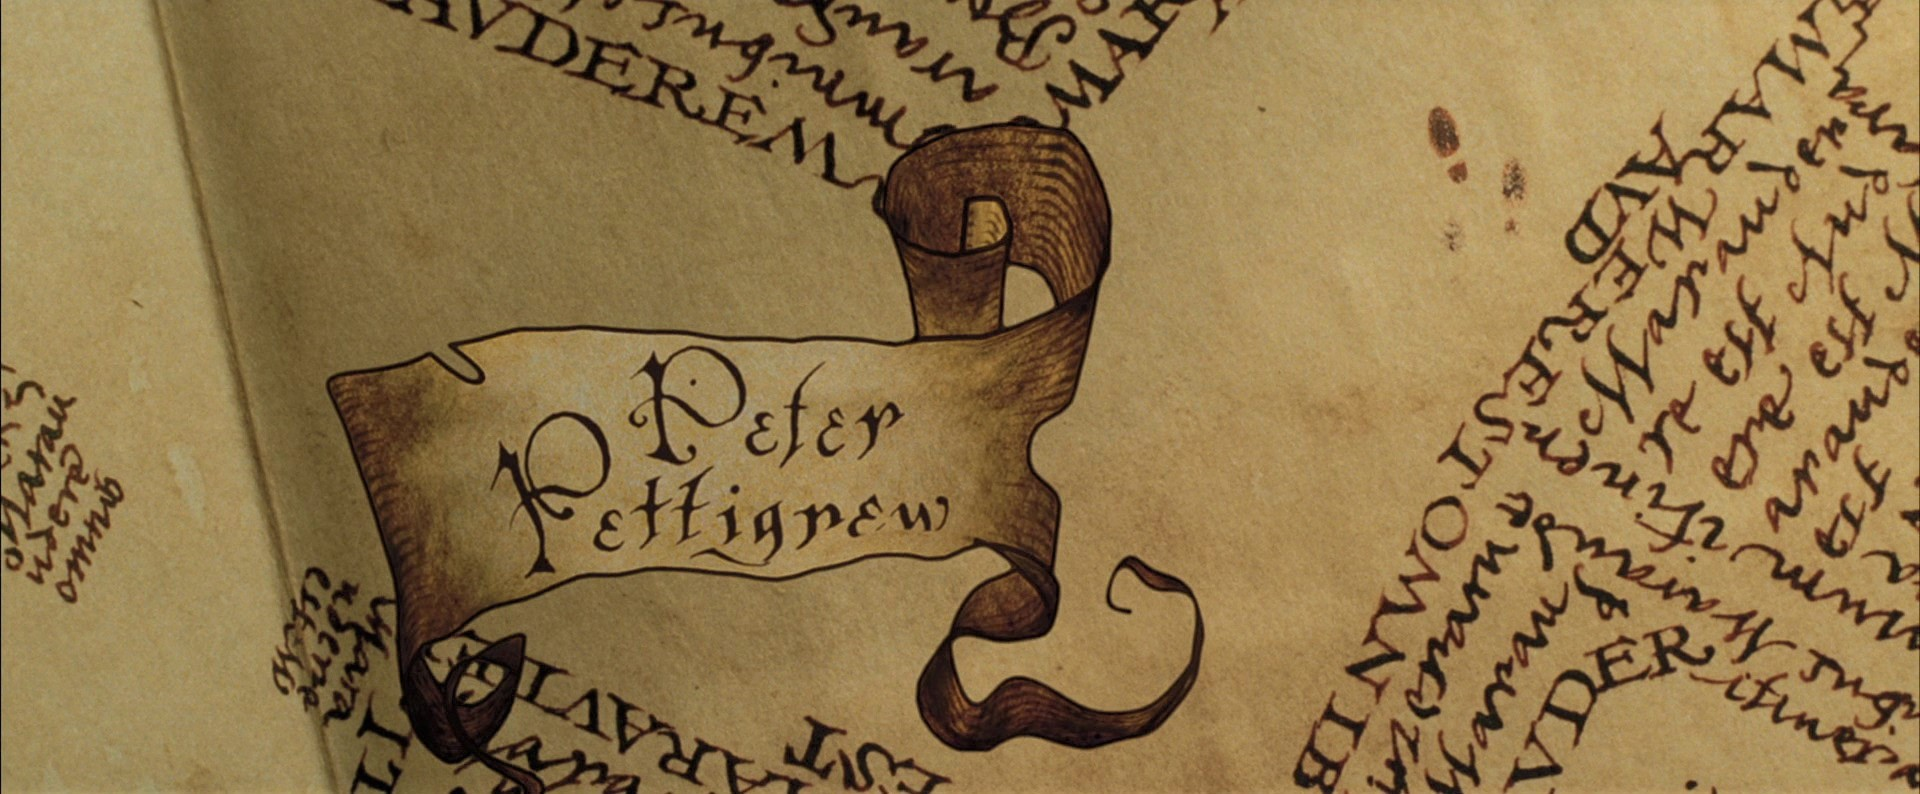 Marauder's Map | Harry Potter Wiki | FANDOM powered by Wikia on secret s map harry potter, map in game of thrones, map harry potter books, fictional map harry potter,